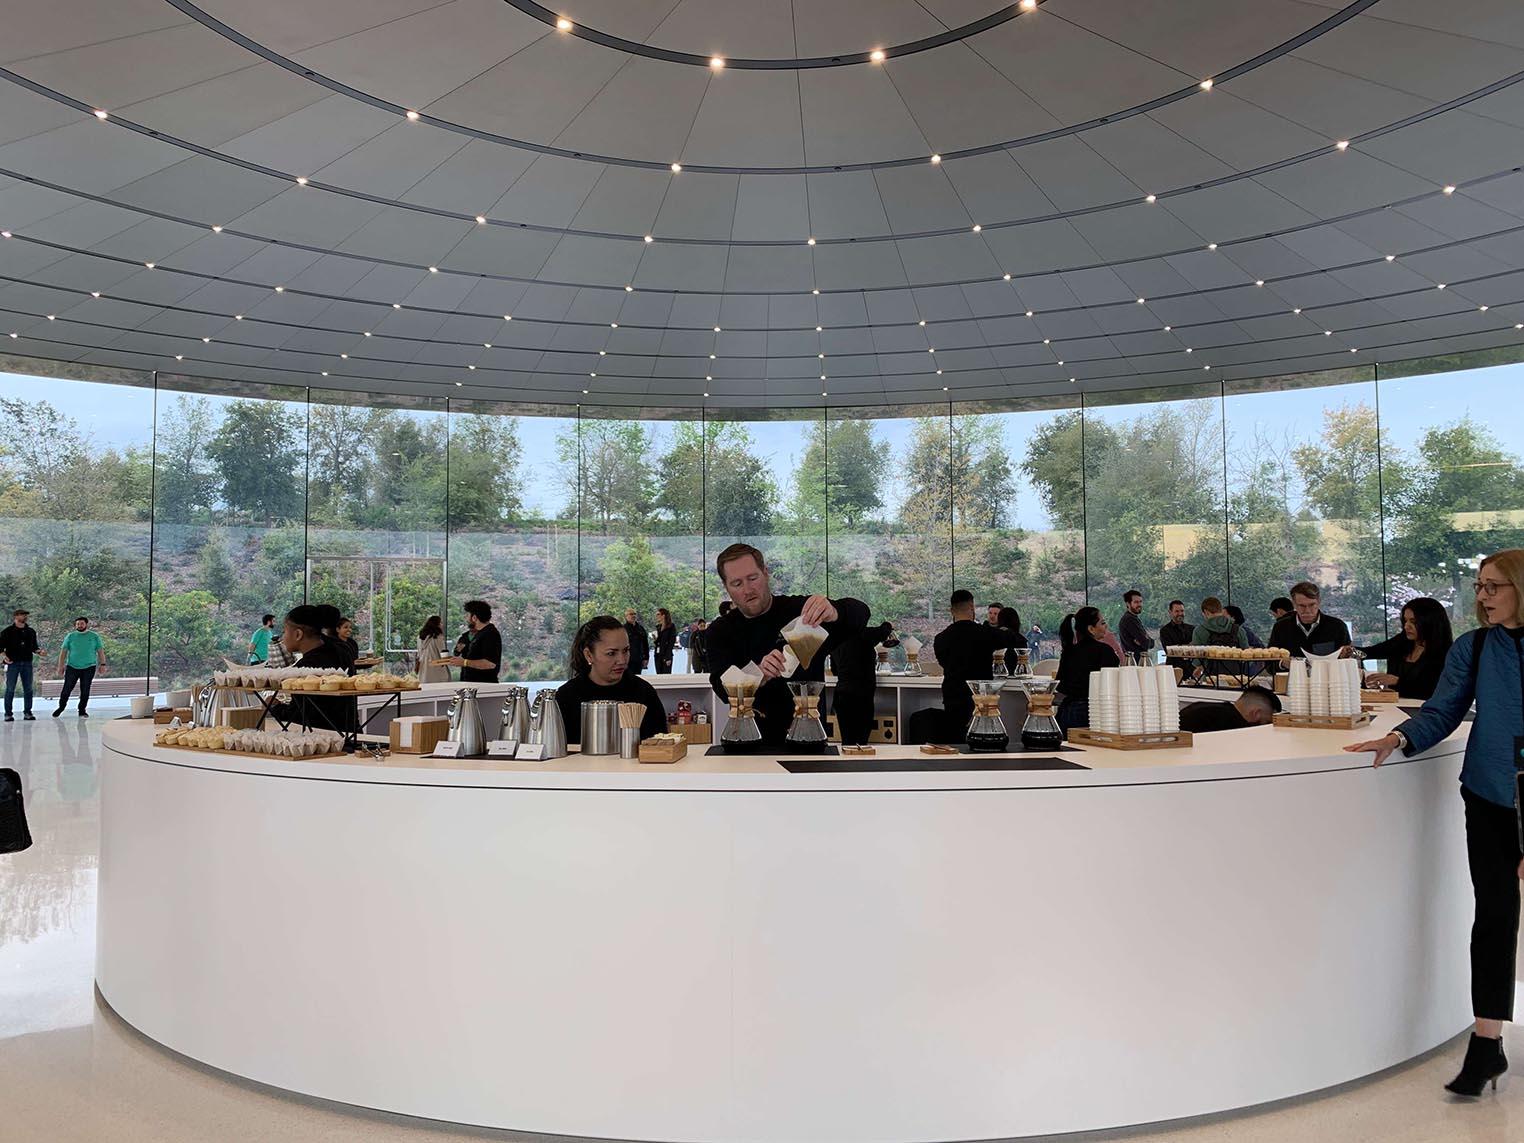 Apple Event Steve Jobs Theater petit déjeuner